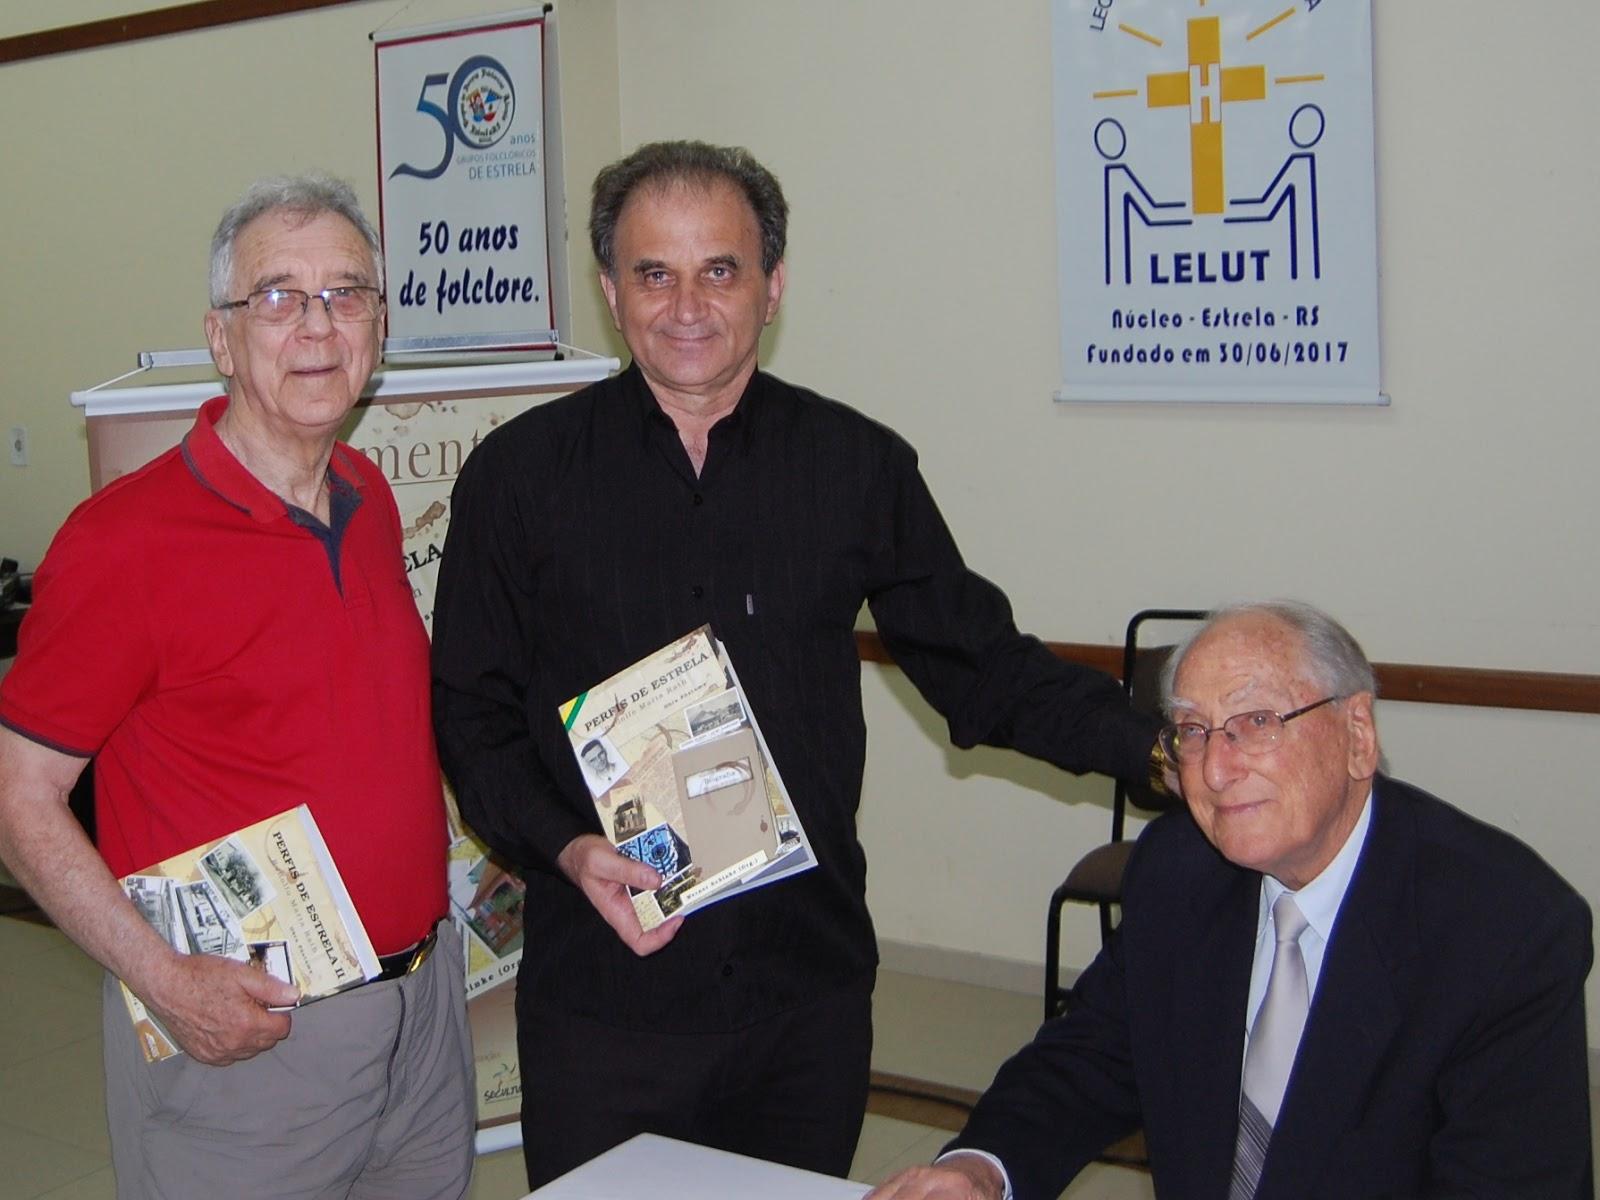 Airton Engster dos Santos, Adonis Fauth e Werner Schinke